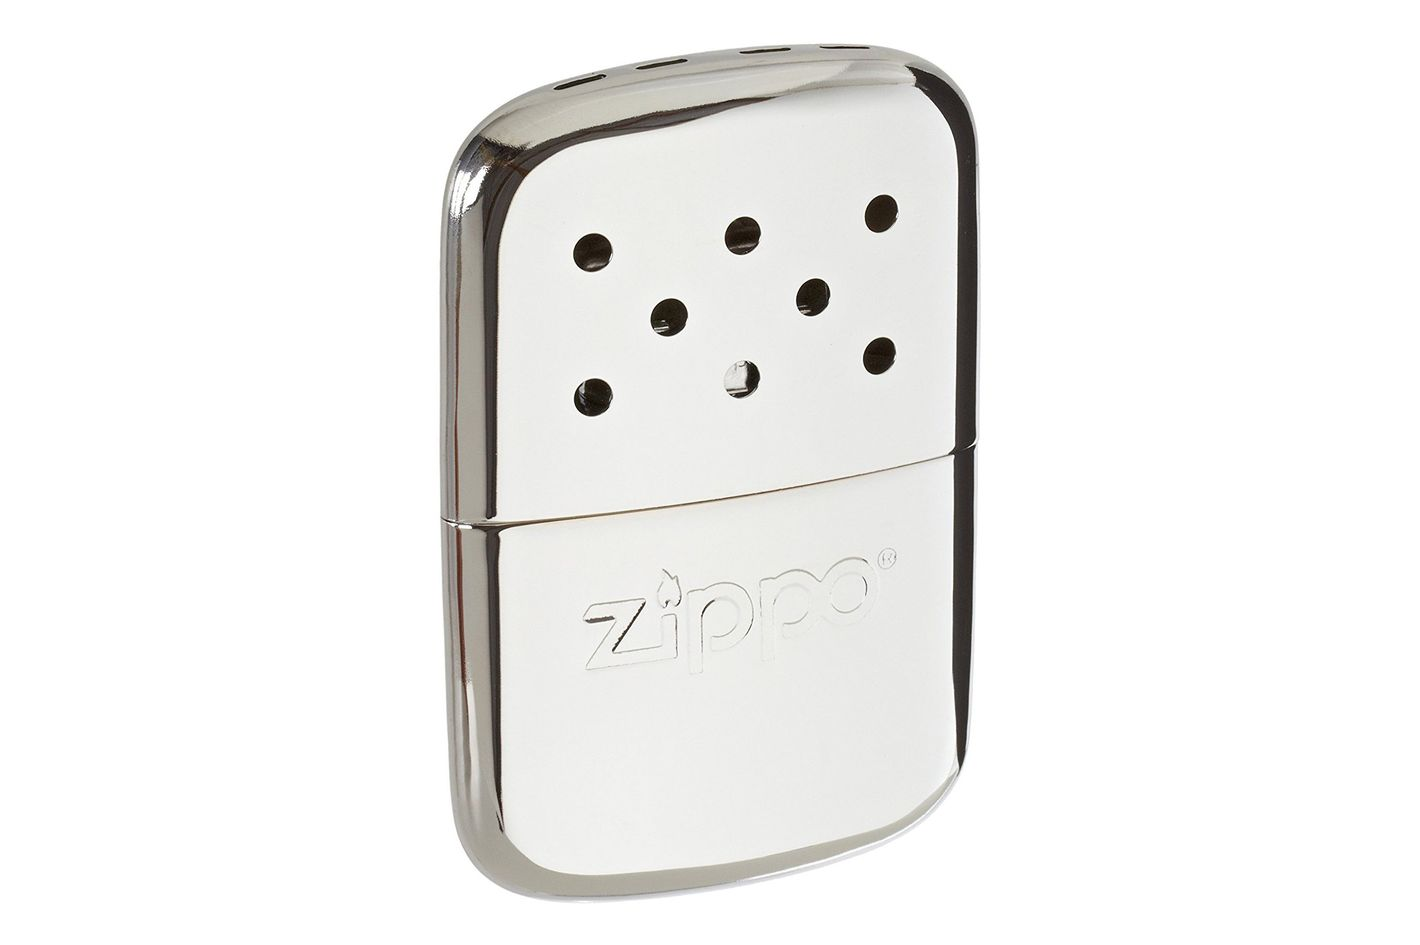 Zippo reusable hand warmer